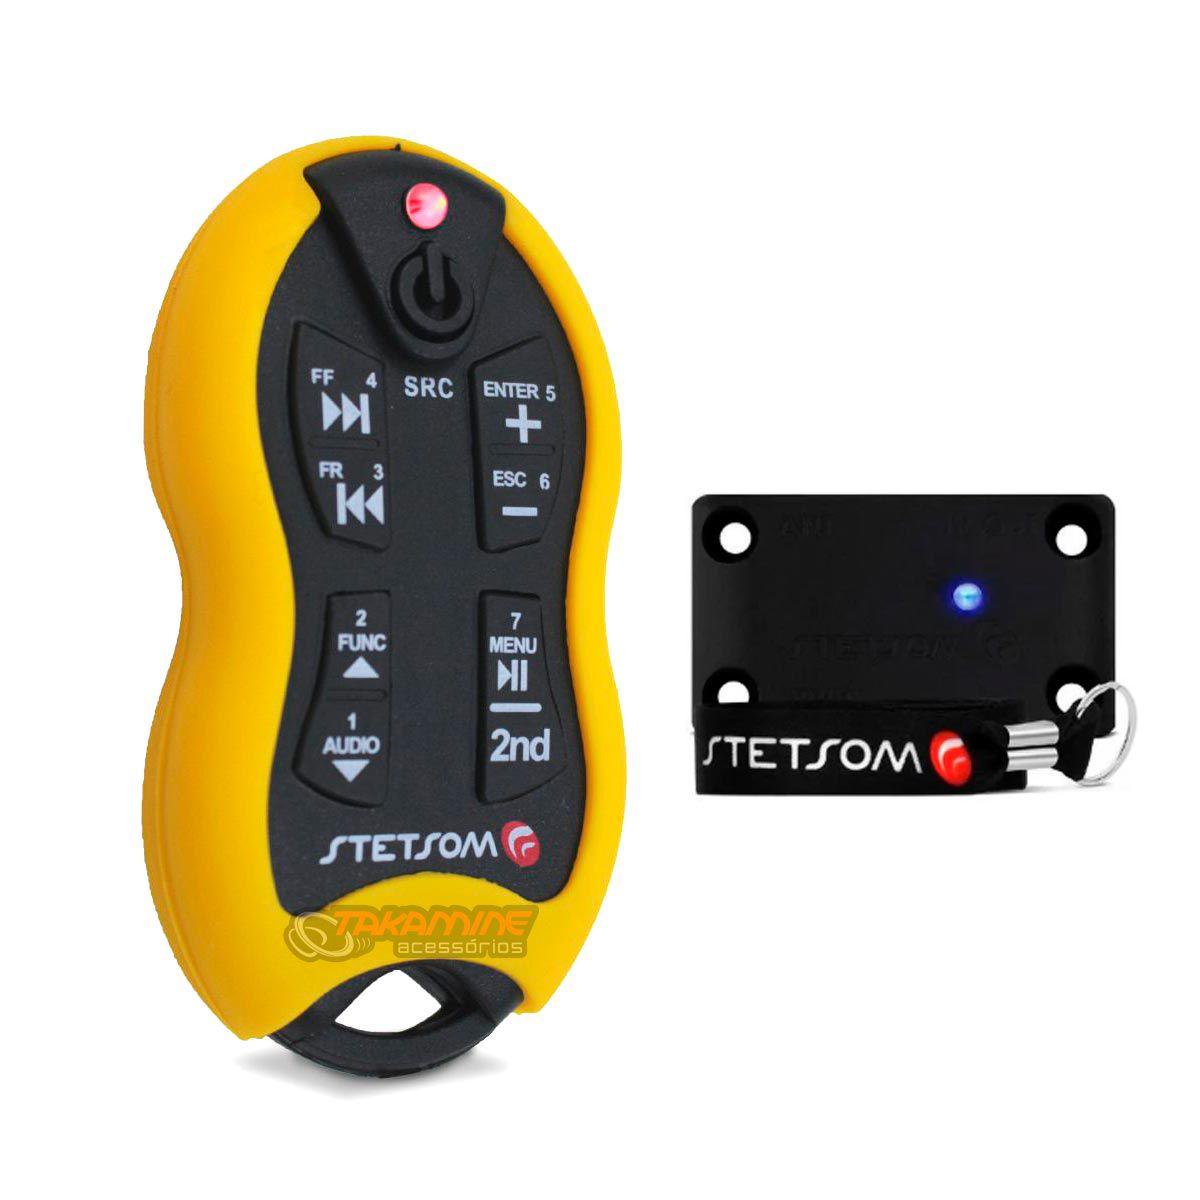 Controle longa distância Stetsom SX2 universal 500 metros